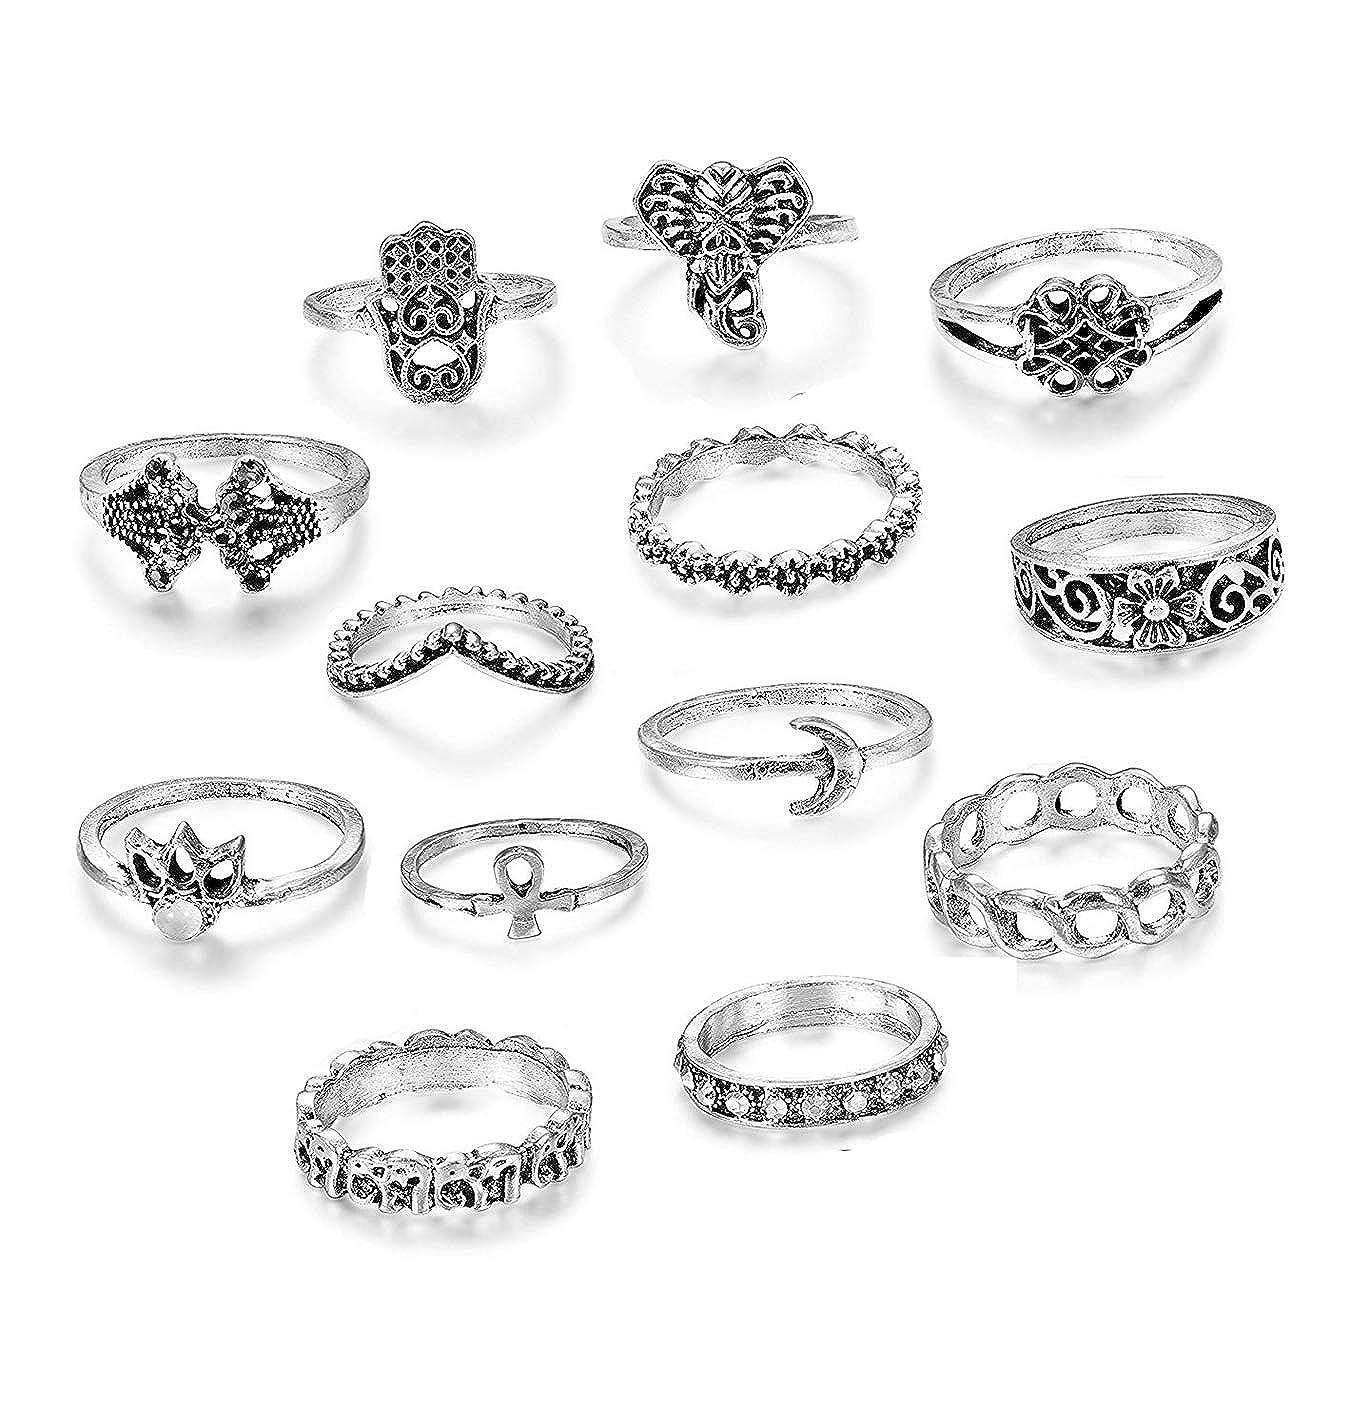 3711add33ea4 Besteel Aleación Anillos de uñas de nudillo para Mujeres niñas Boho Bohemio  Anillo apilable Conjunto de